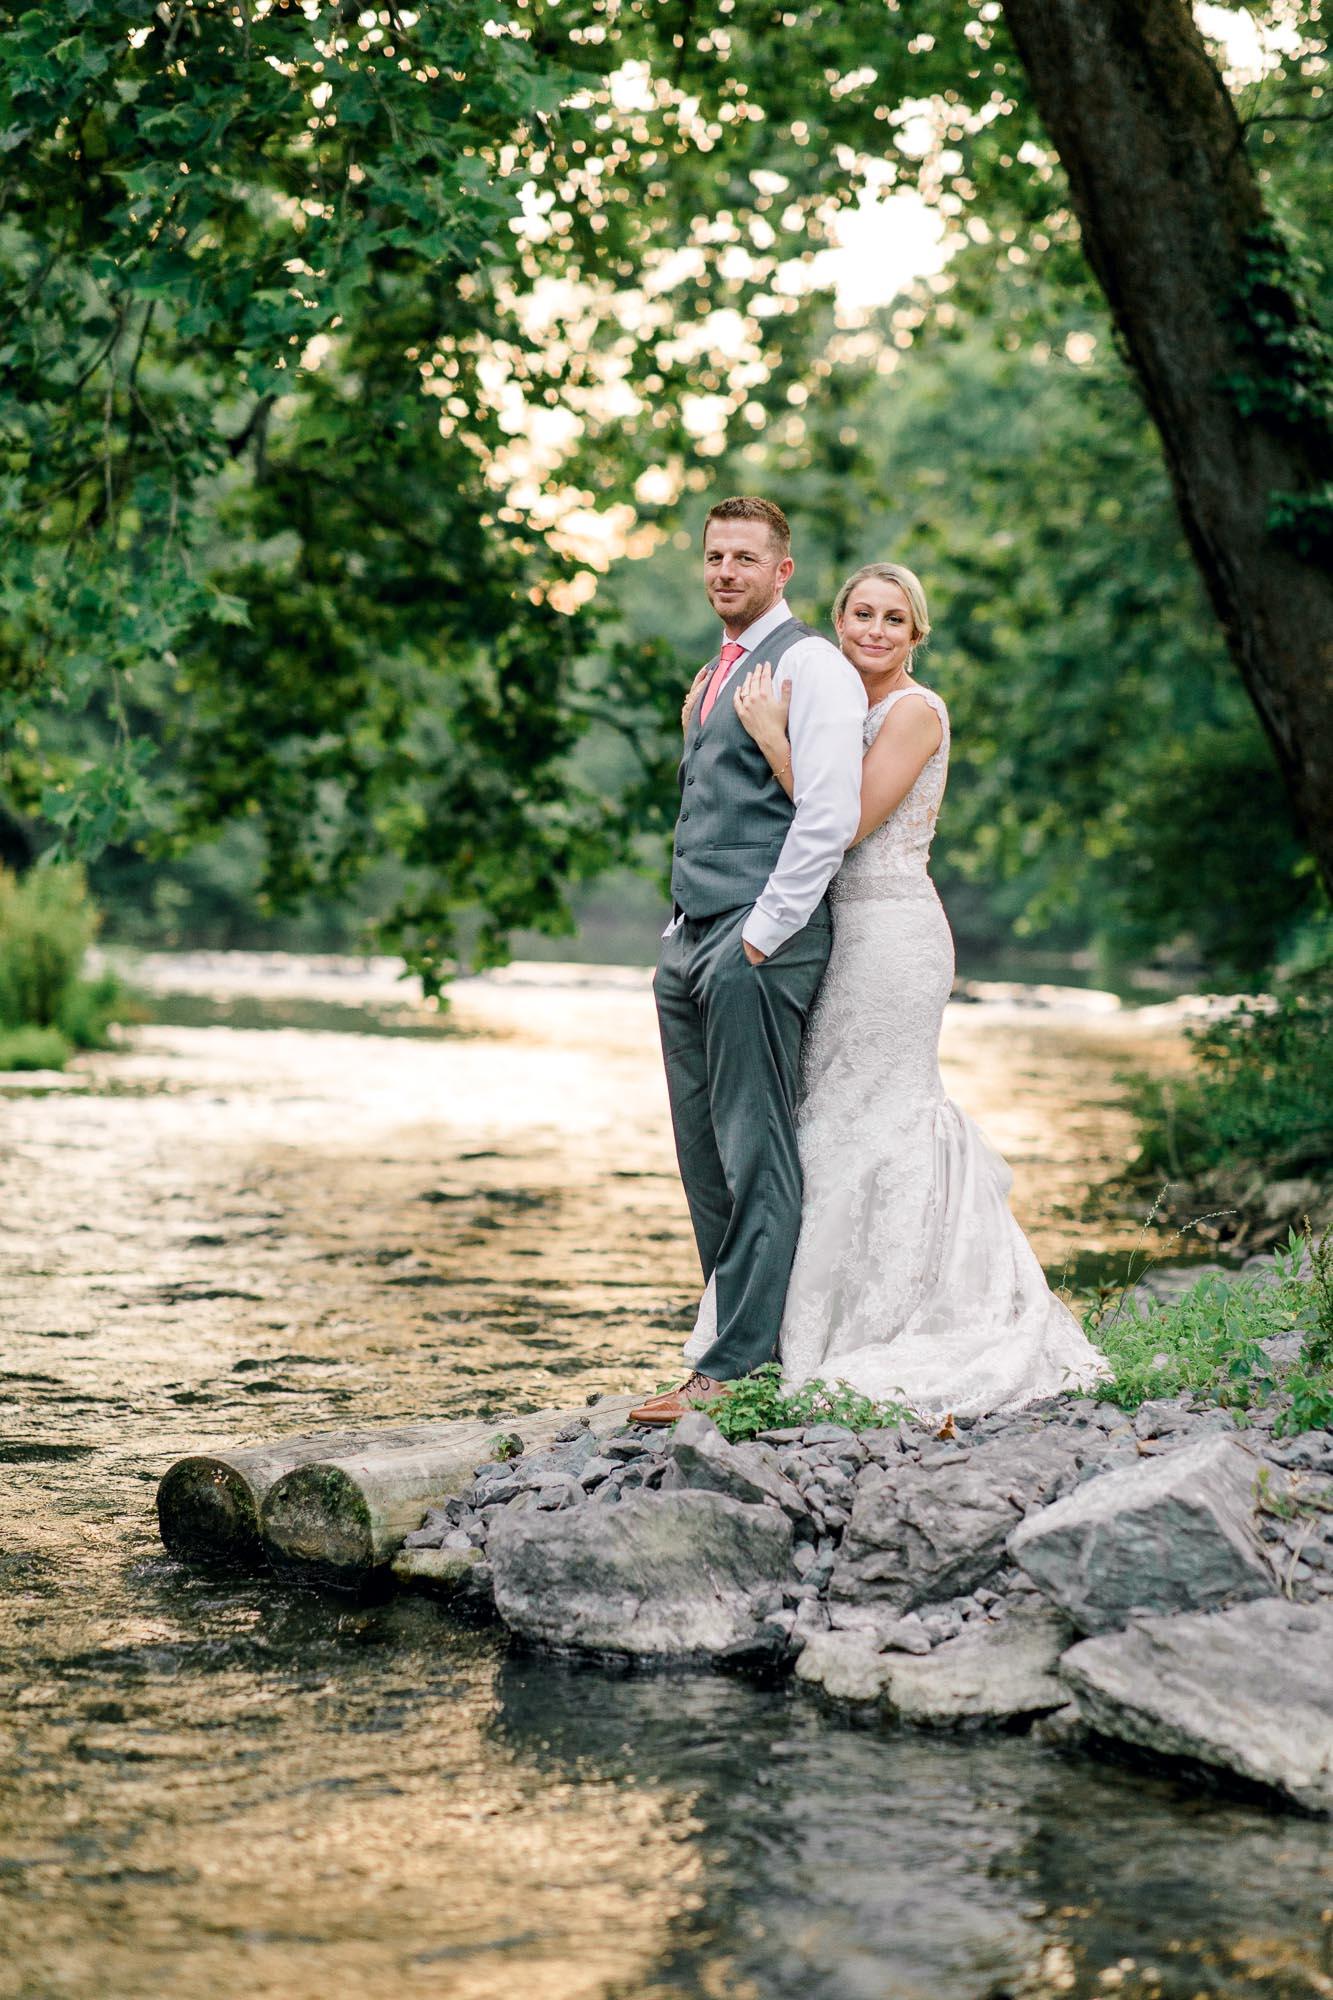 Allenberry-resort-historic-pennsylvania-wedding-22524.jpg